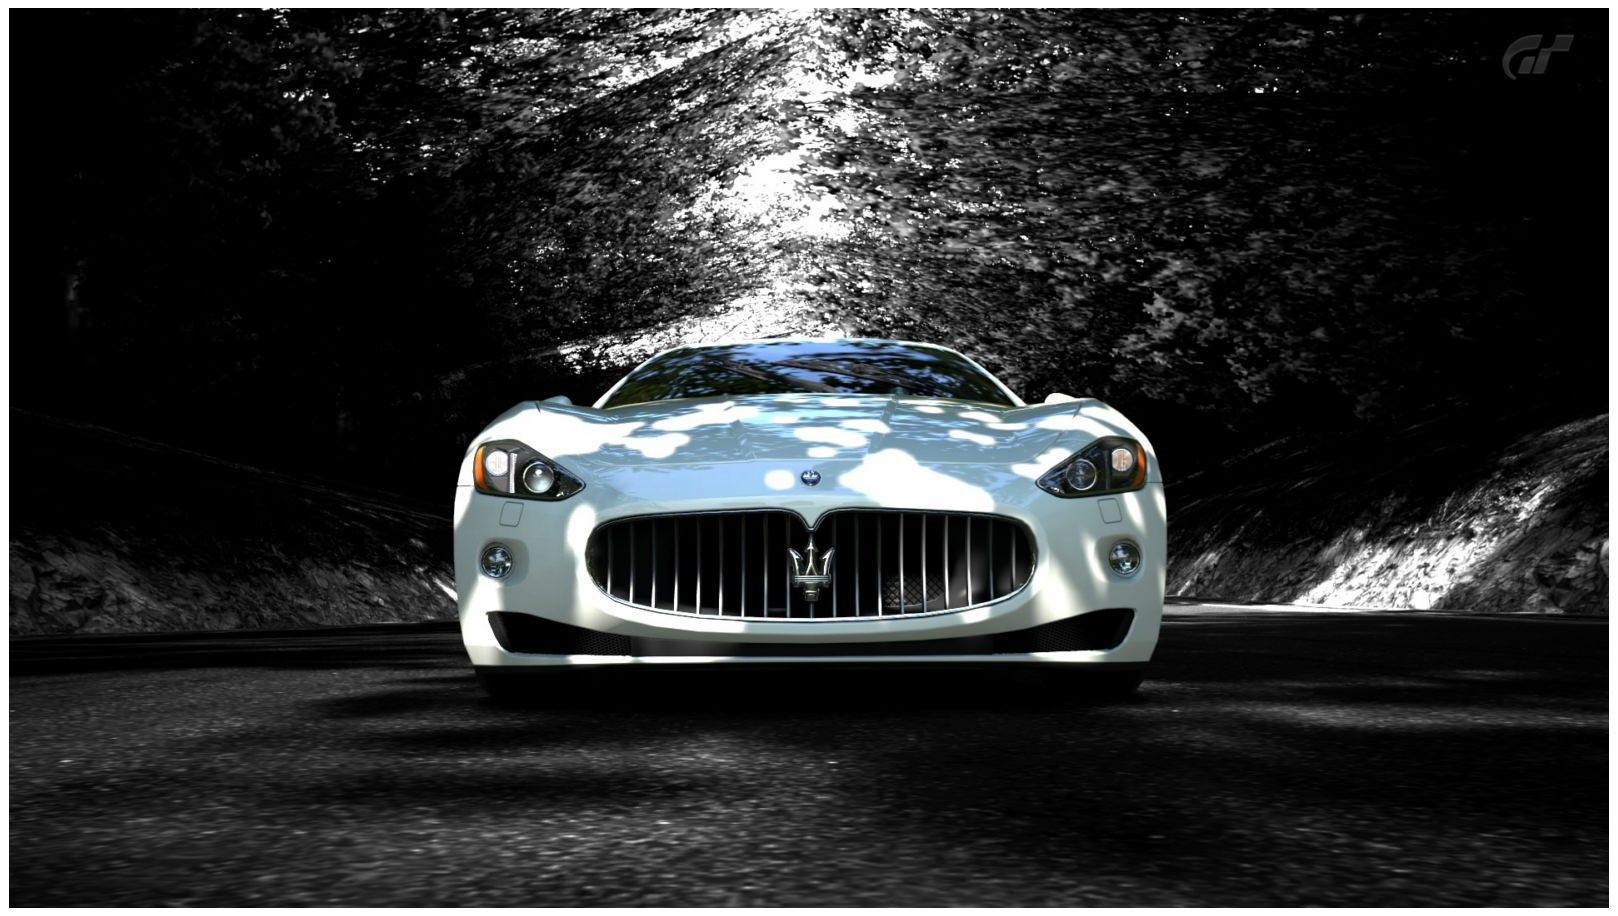 Hình nền xe Maserati Granturismo HD 1618x916 mới